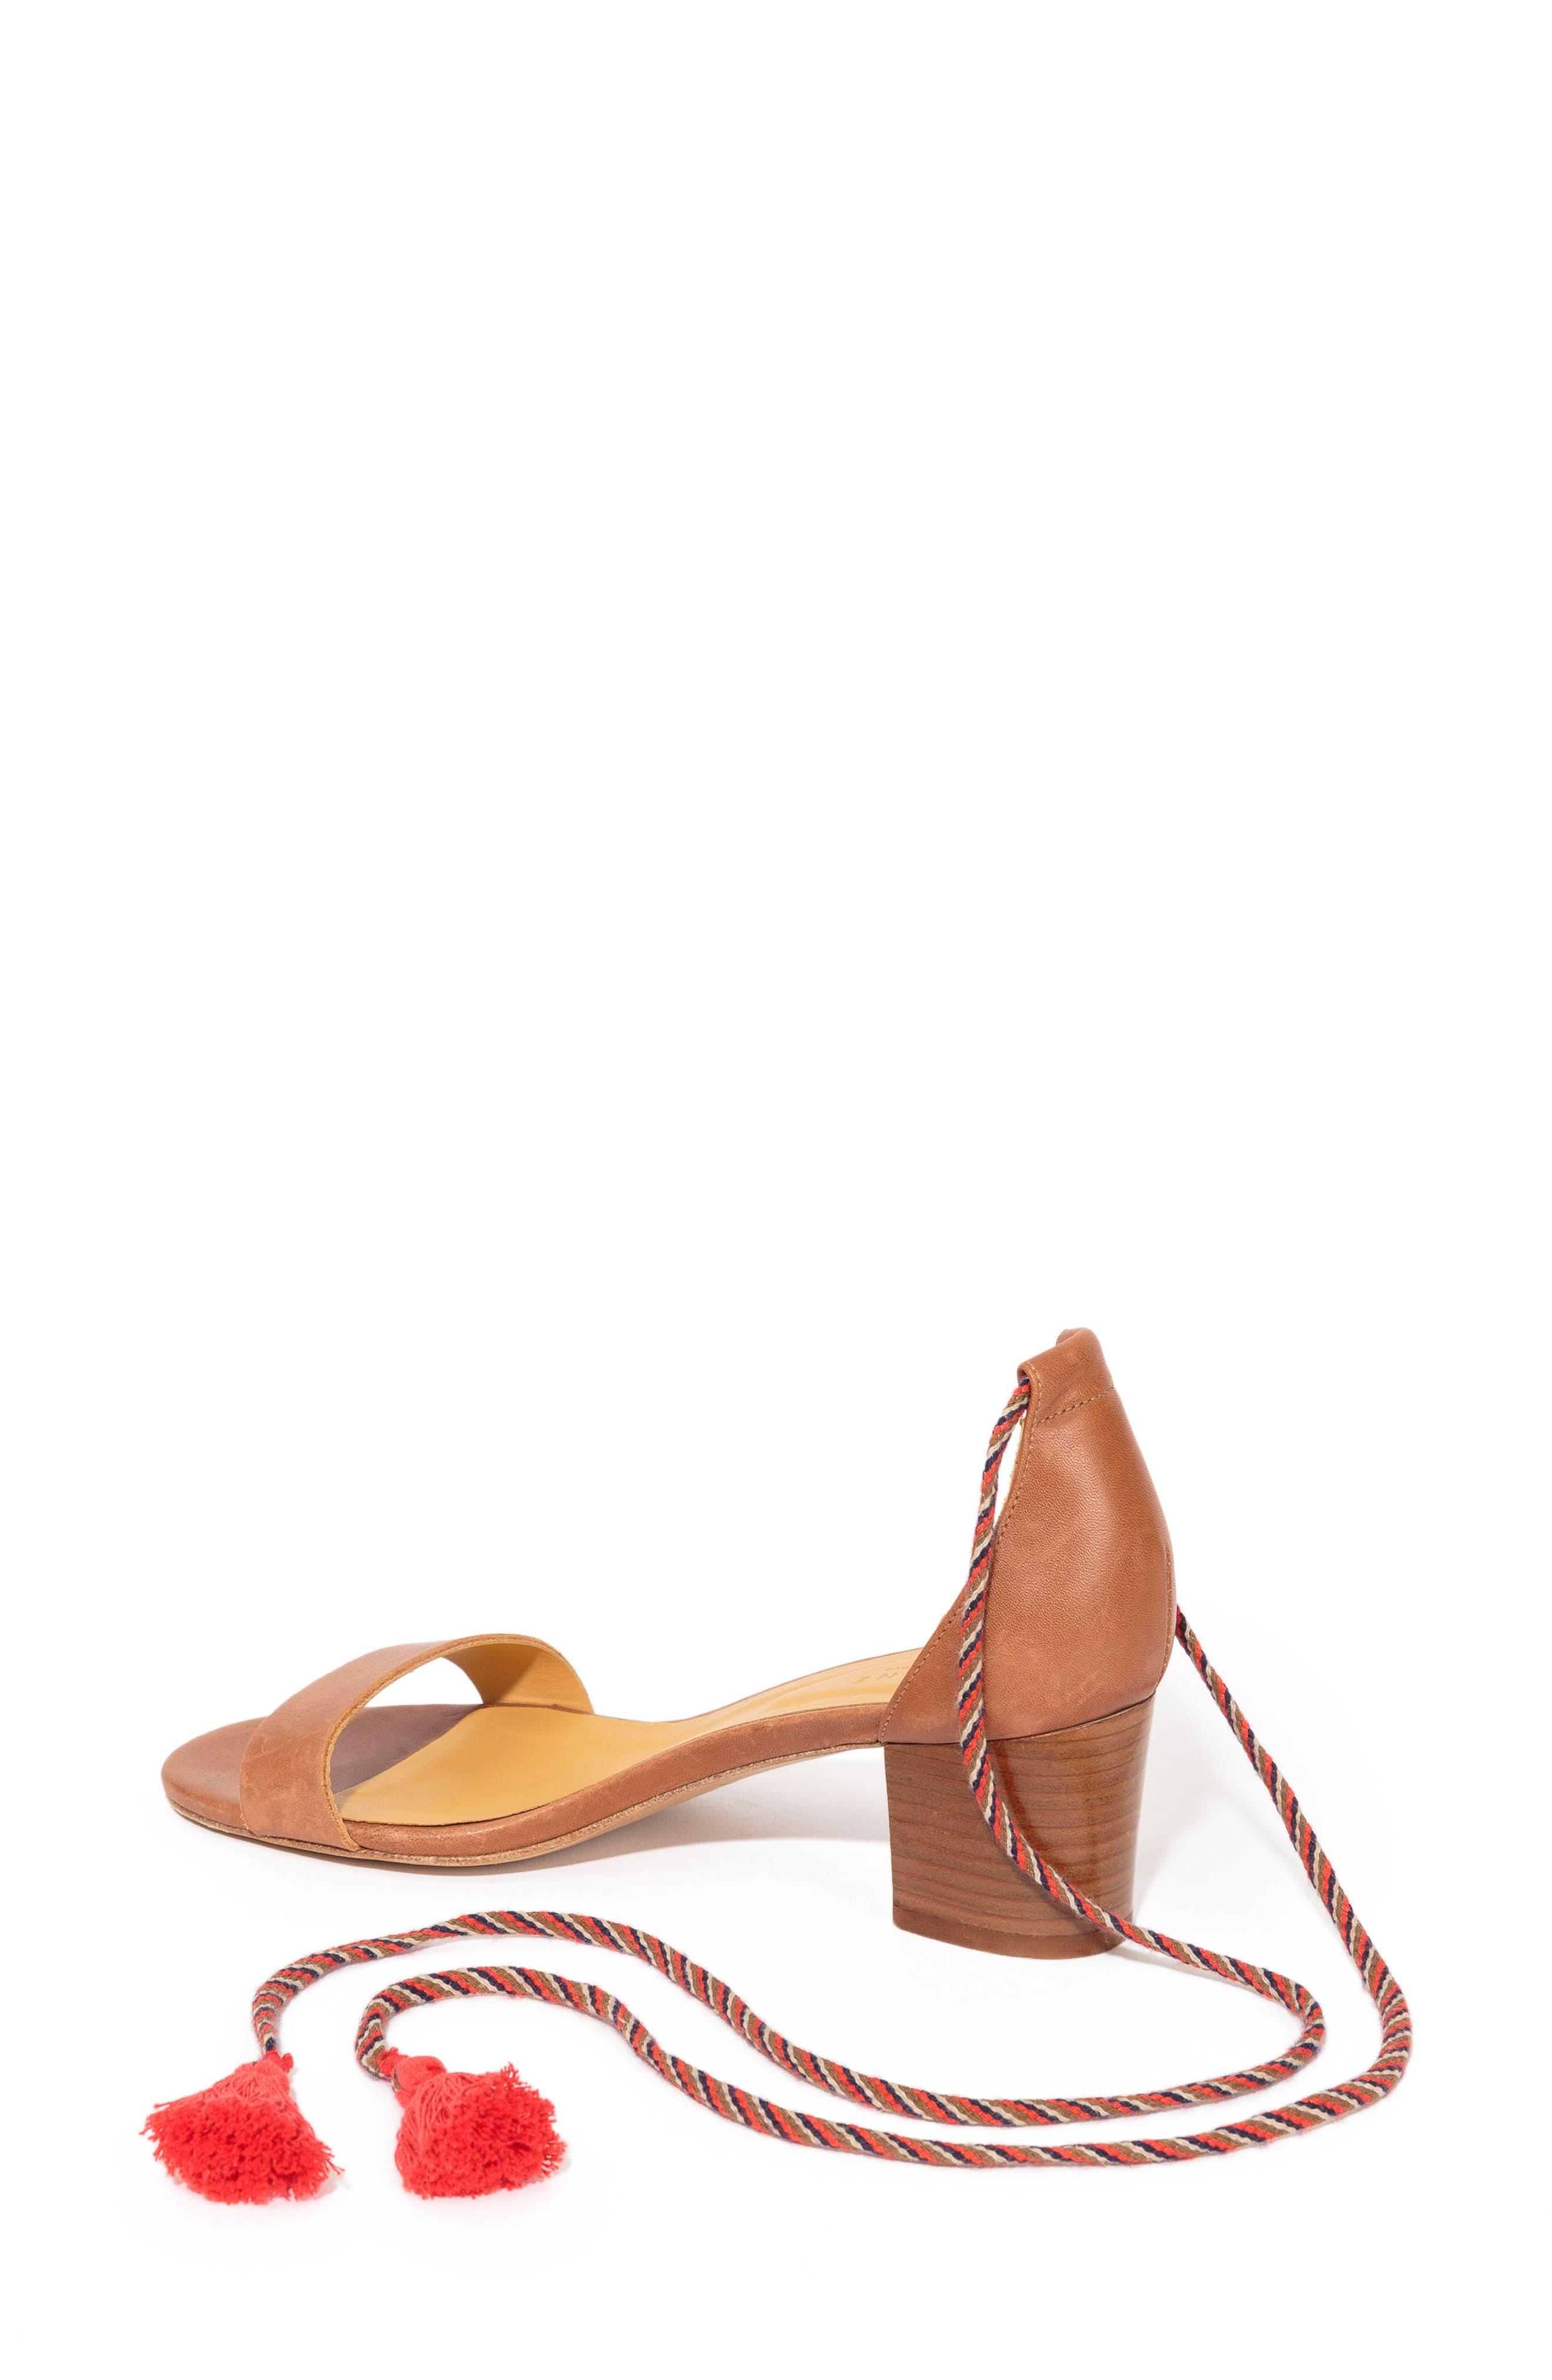 Lorenzo Ankle Wrap Block Heel Sandal,                             Alternate thumbnail 2, color,                             CAMEL LEATHER